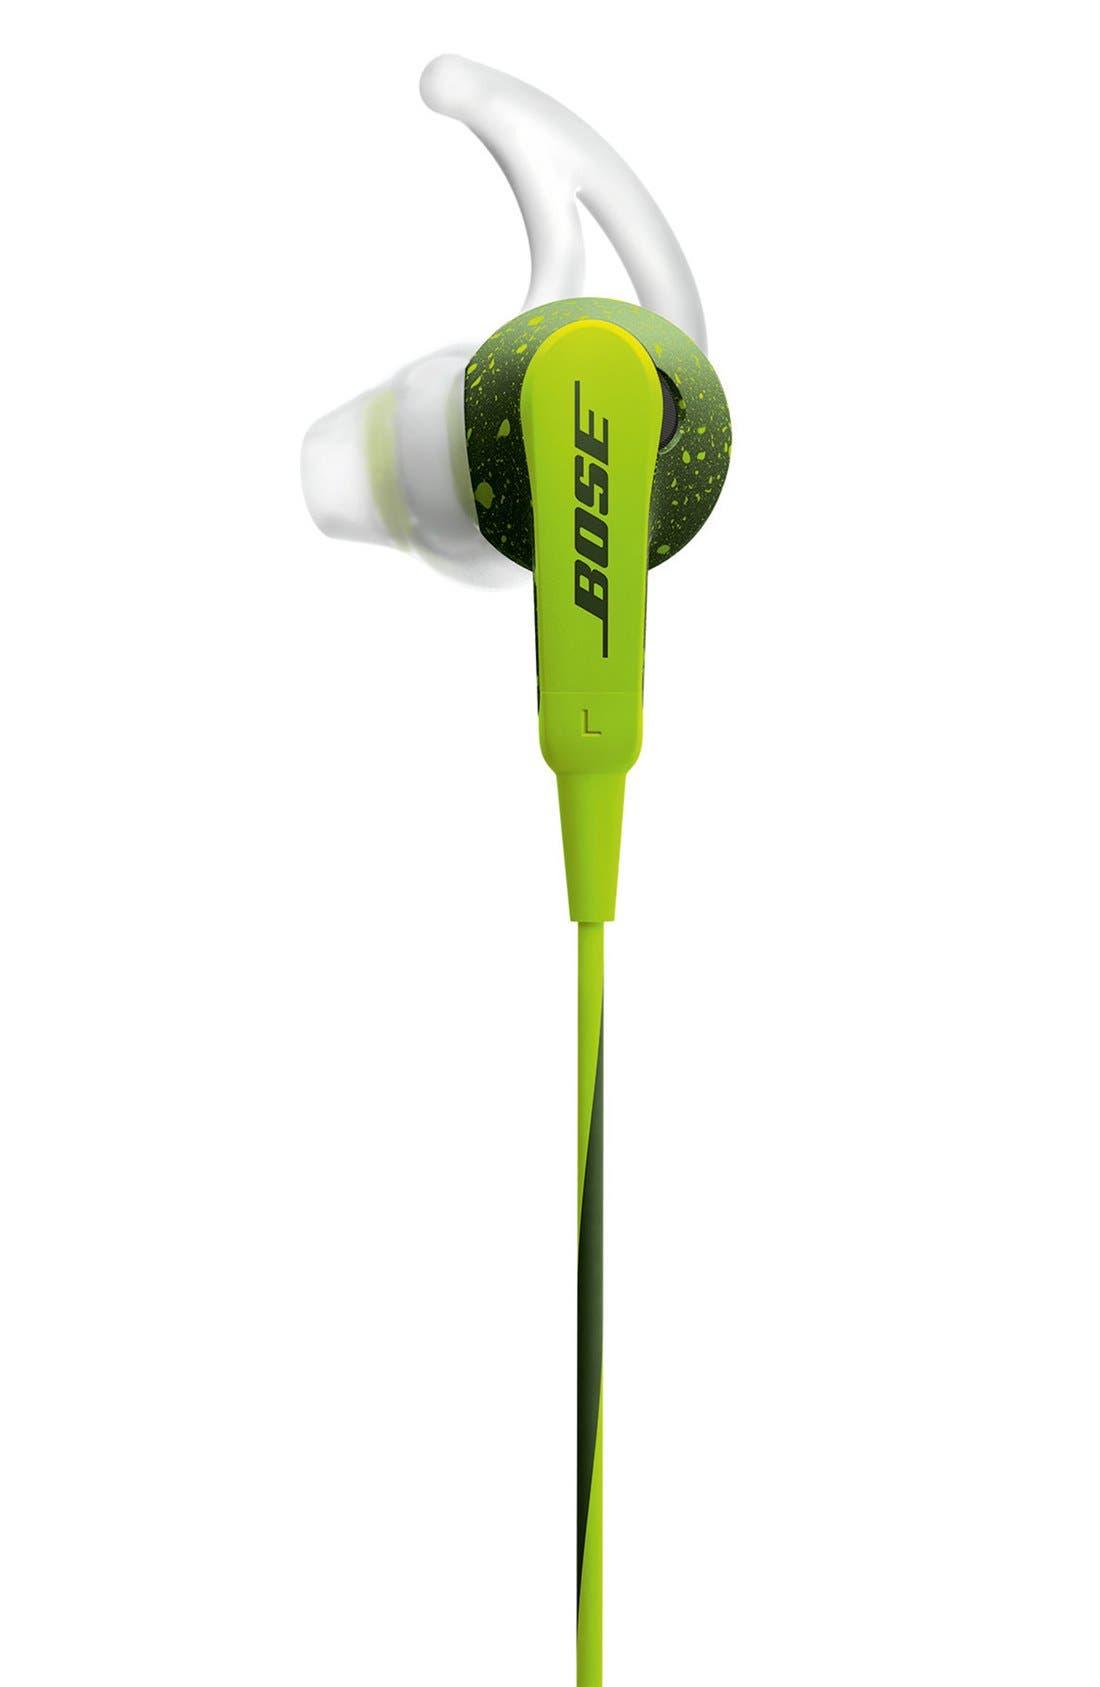 SoundSport<sup>®</sup> In-Ear Headphones,                             Main thumbnail 1, color,                             300